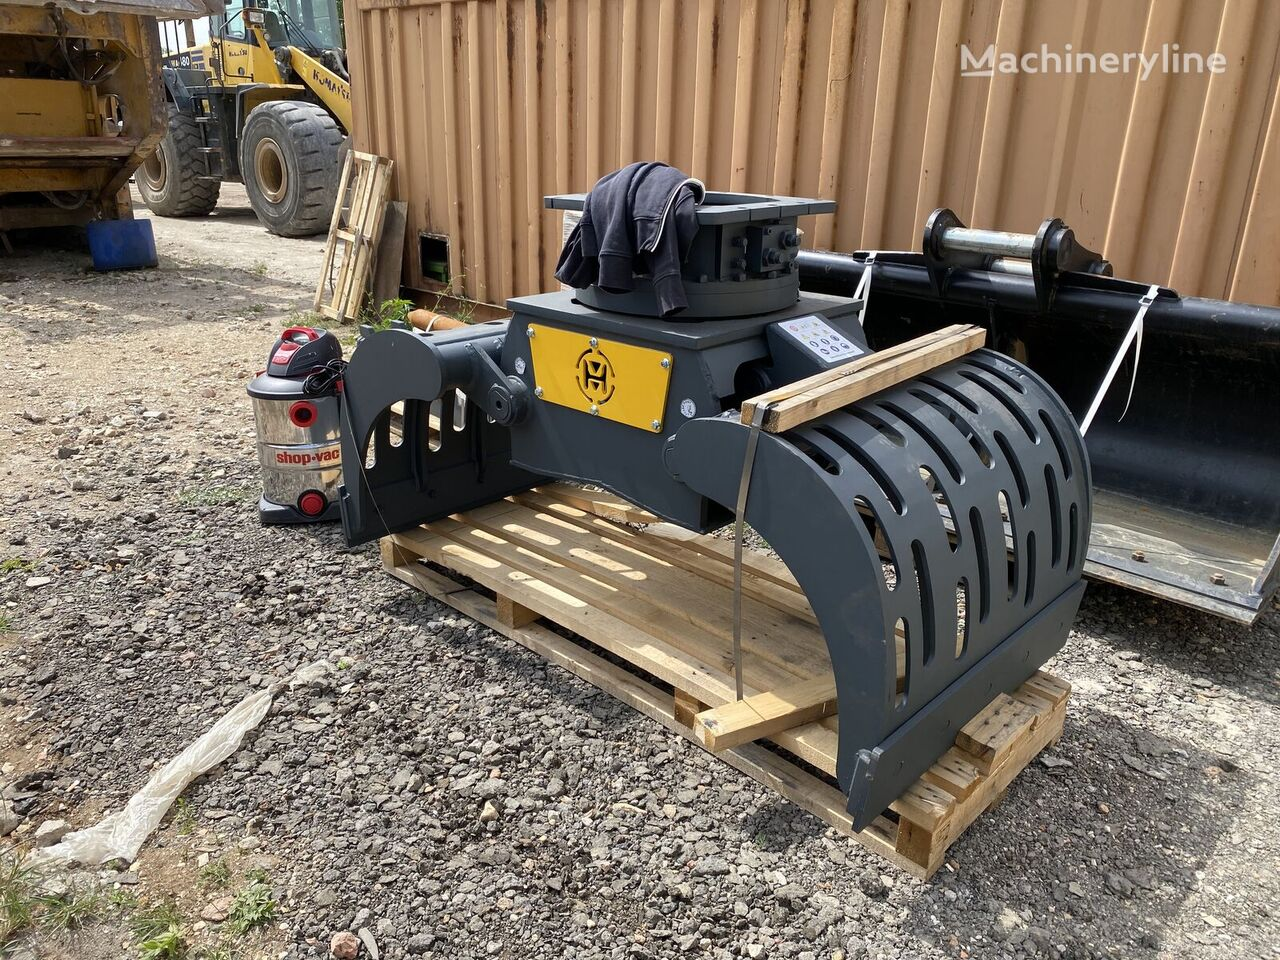 new MUSTANG GRP1500 hydraulic shears